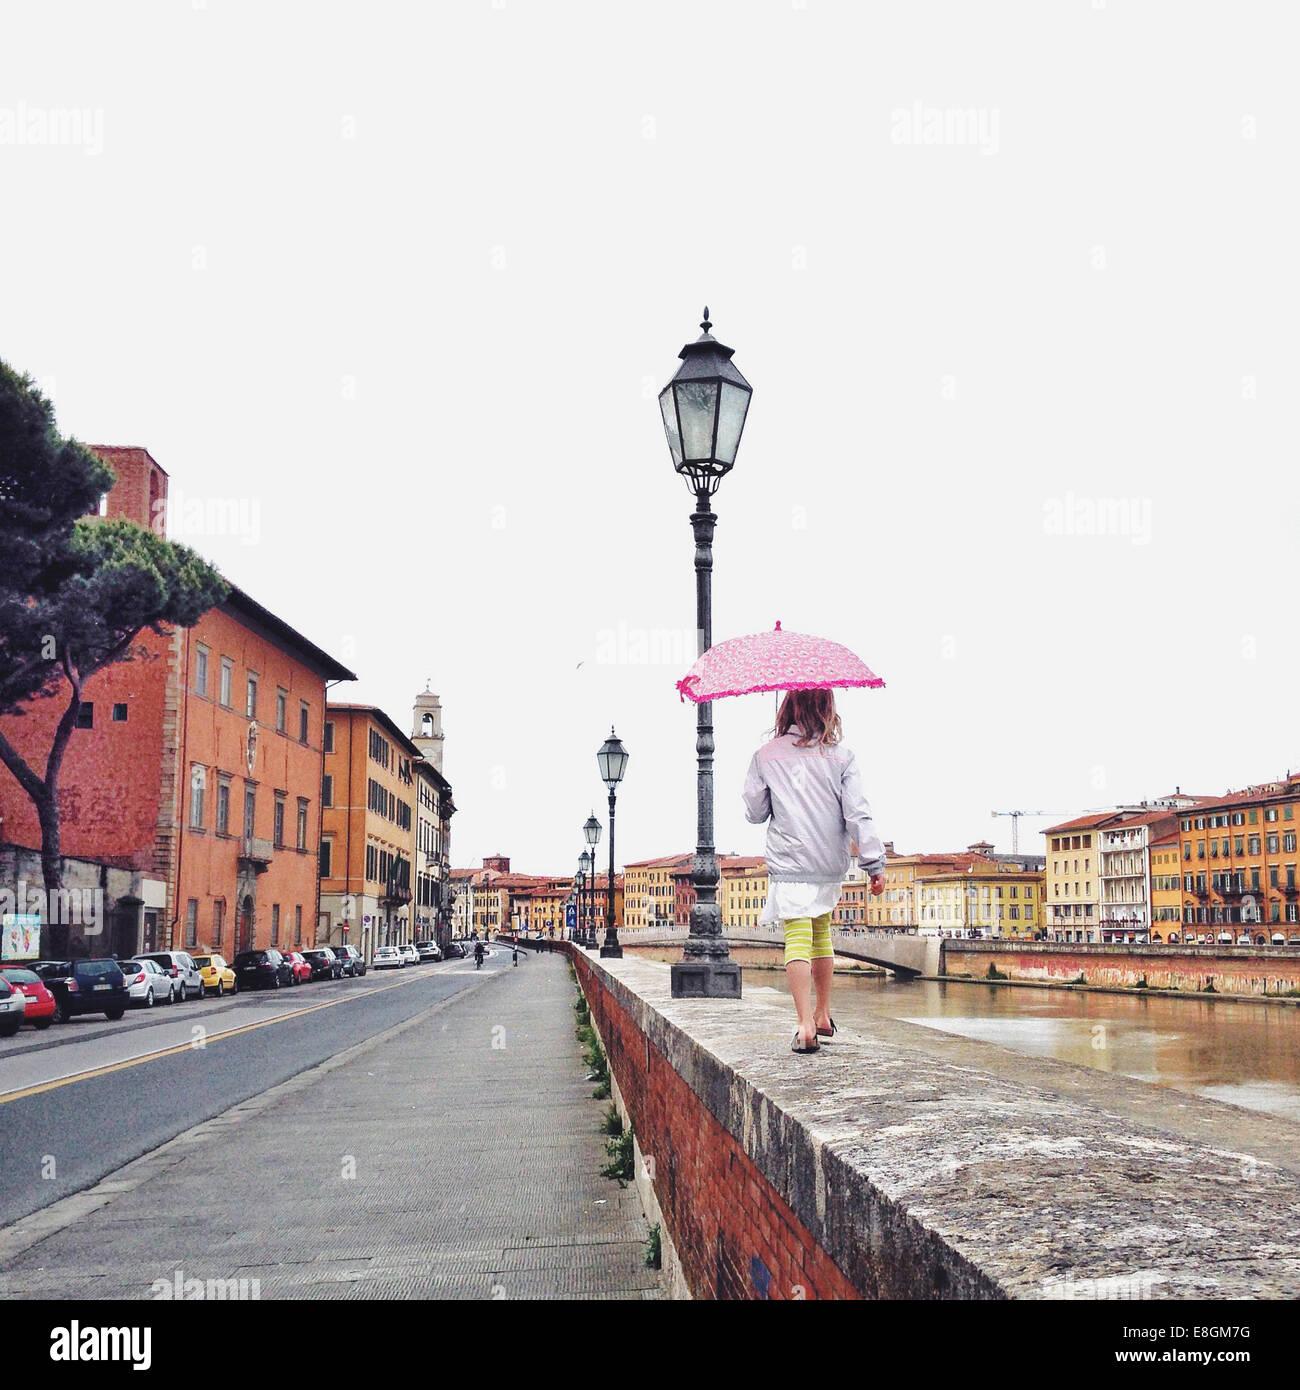 Italien, Toskana, Pisa, Mädchen (12-13) mit Regenschirm auf Sims gehen Stockbild